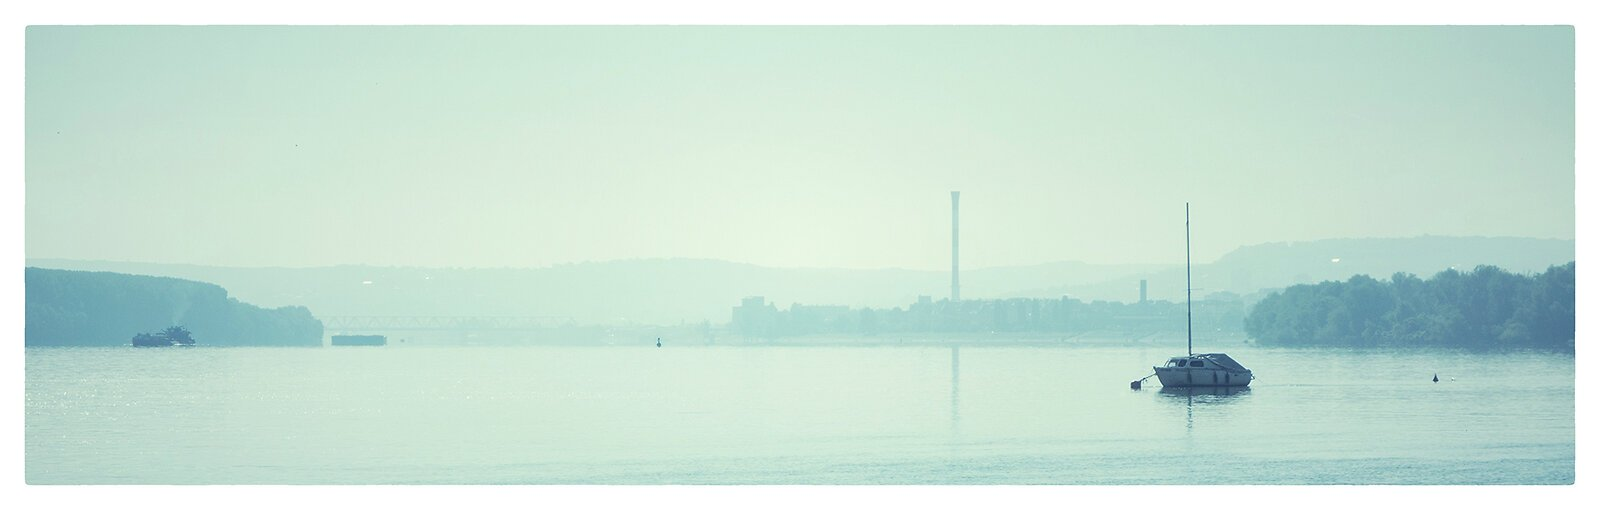 PICTOGRAMAX - 2016 - REFLECTO.jpg